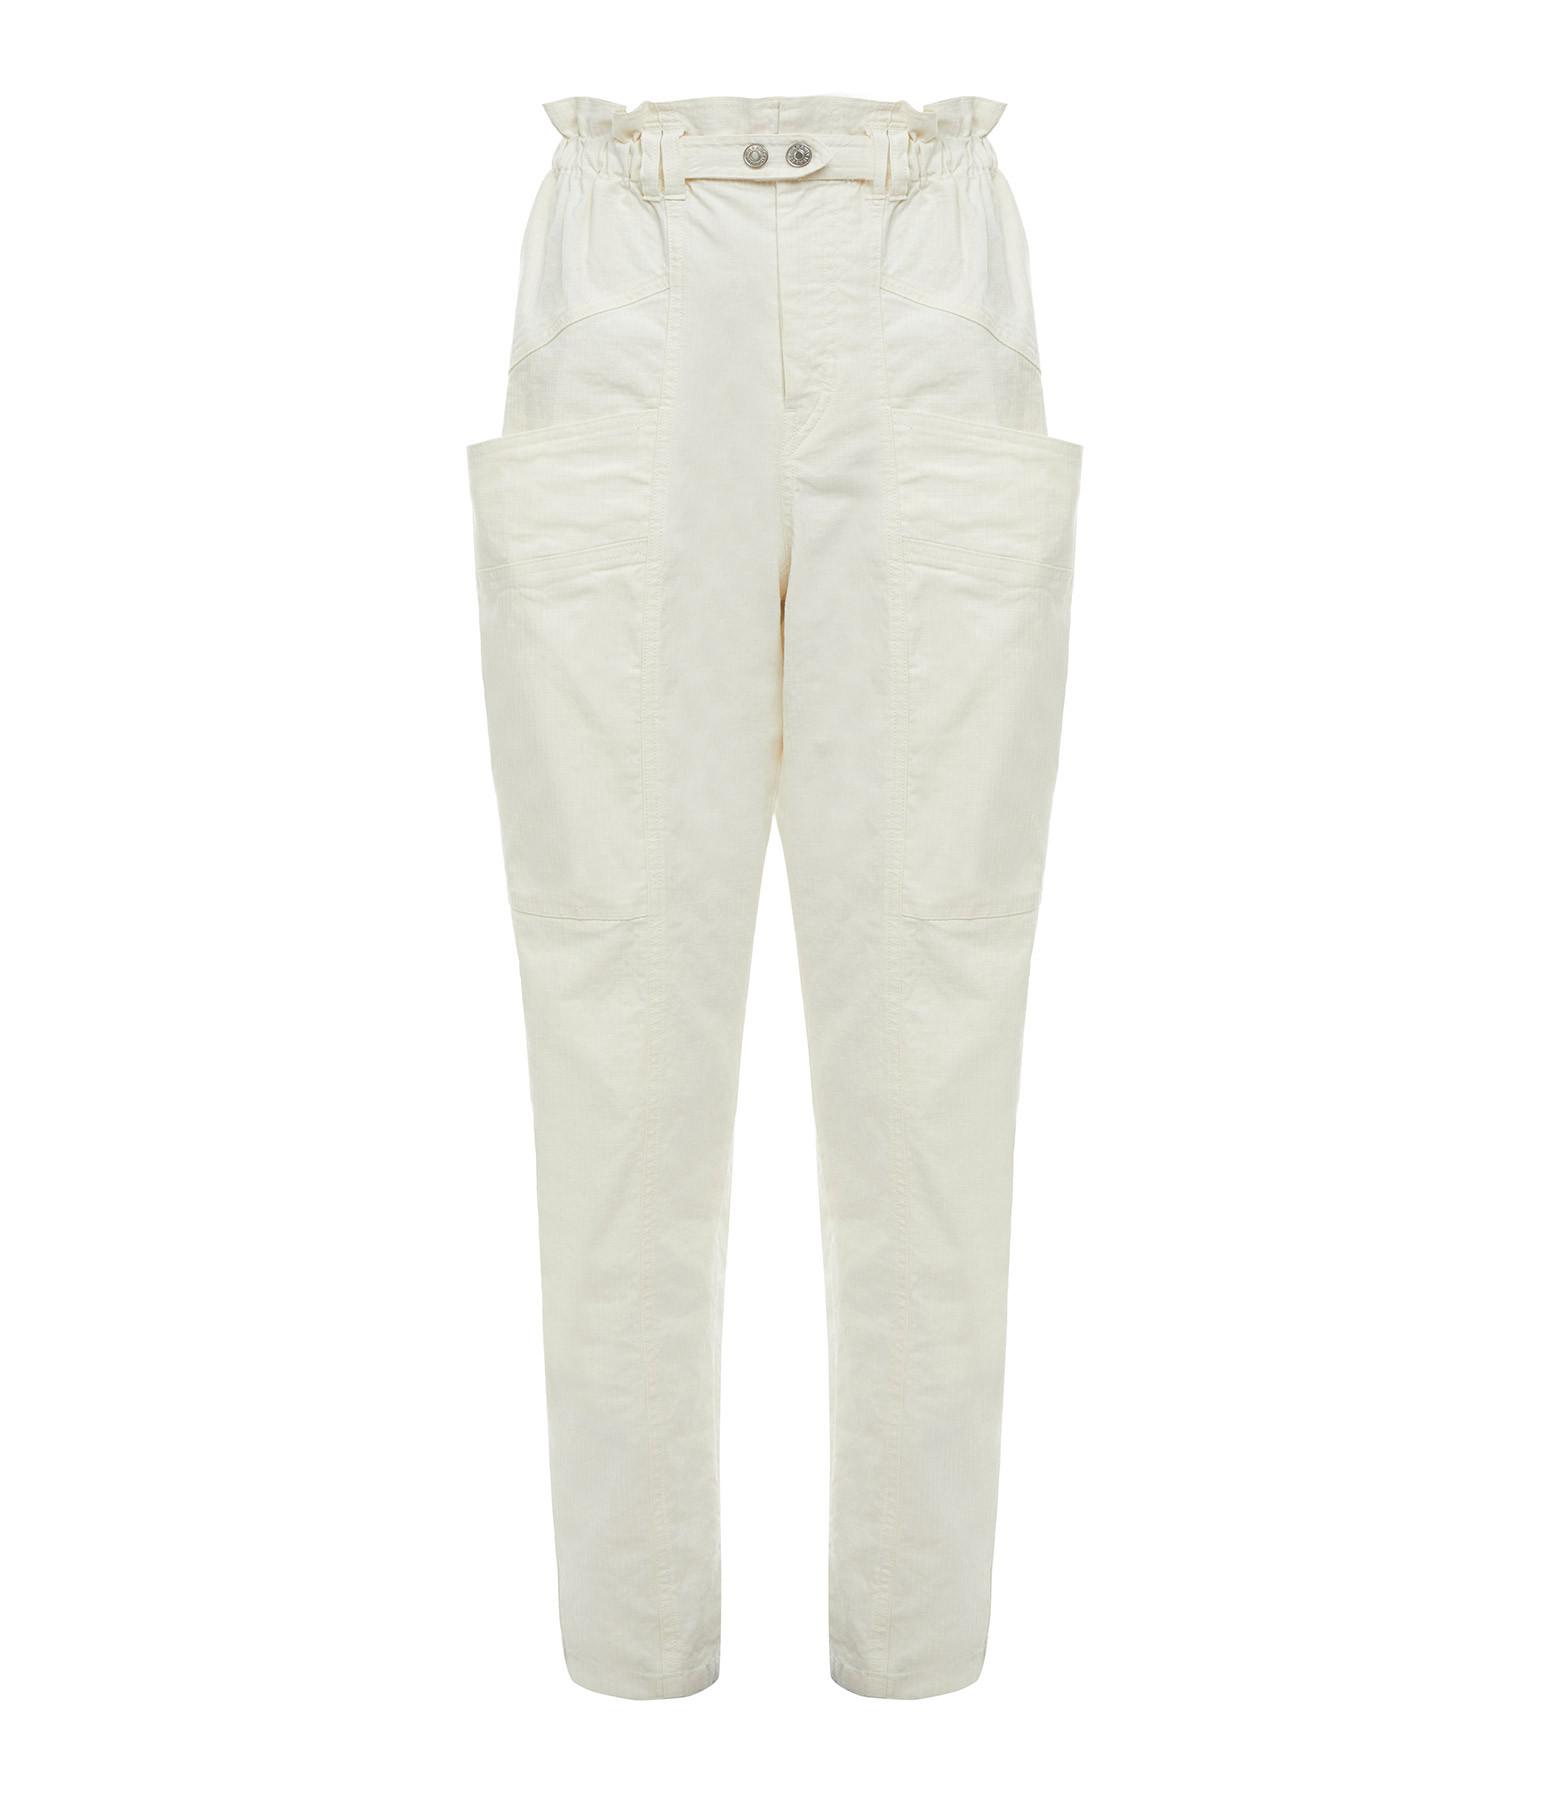 ISABEL MARANT - Pantalon Enucie Lin Coton Écru